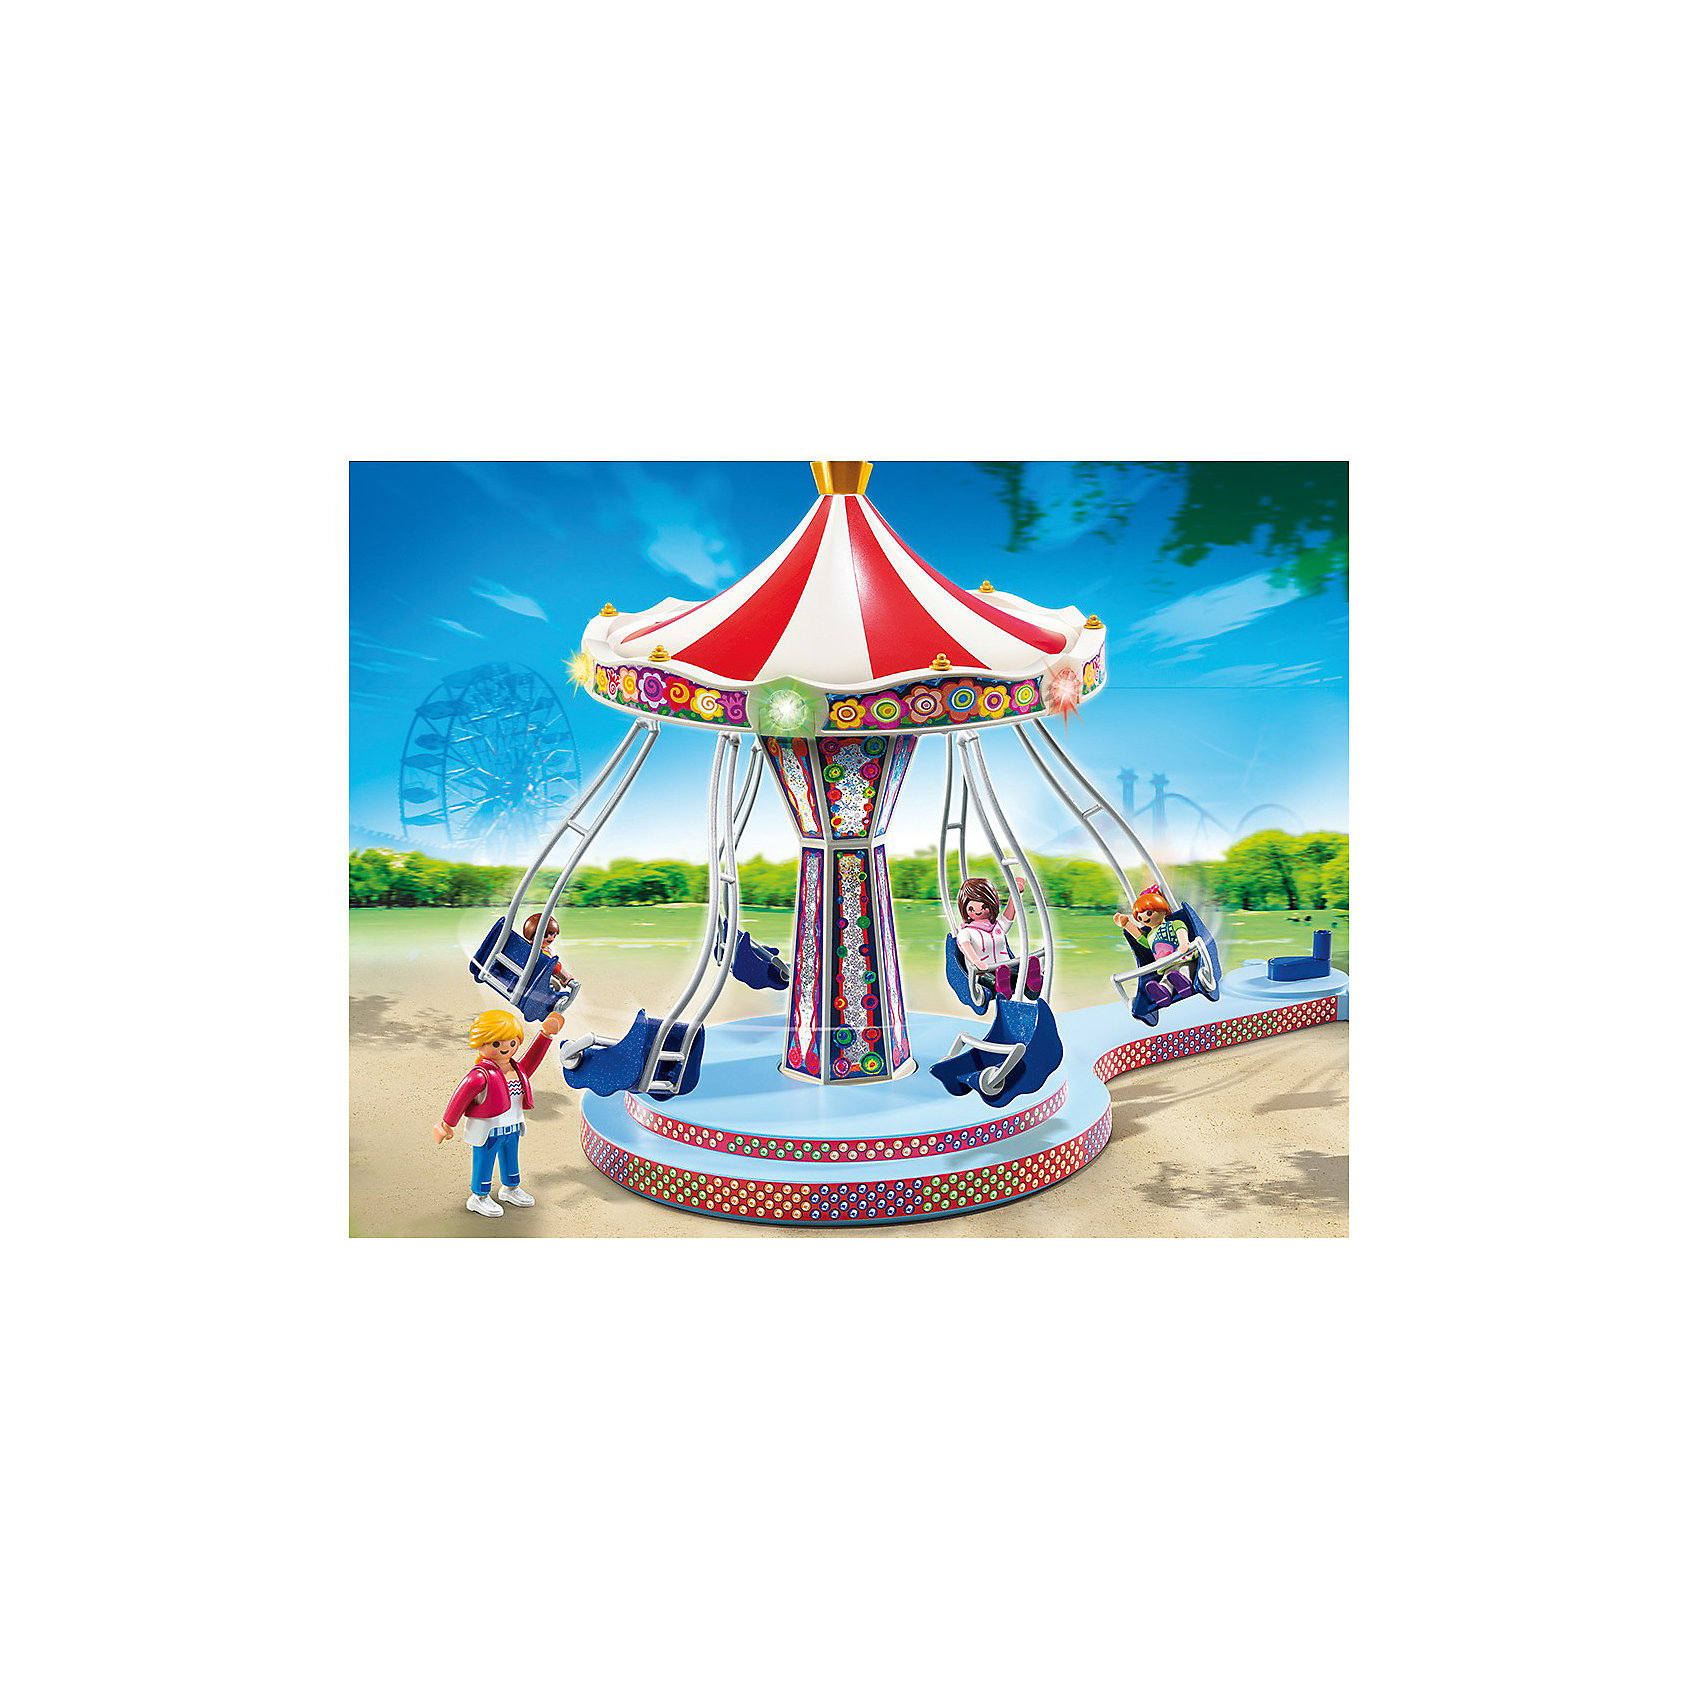 PLAYMOBIL® PLAYMOBIL 5548 Парк Развлечений: Аттракцион Карусель playmobil® playmobil 5546 парк развлечений продавец шаров smileyworld